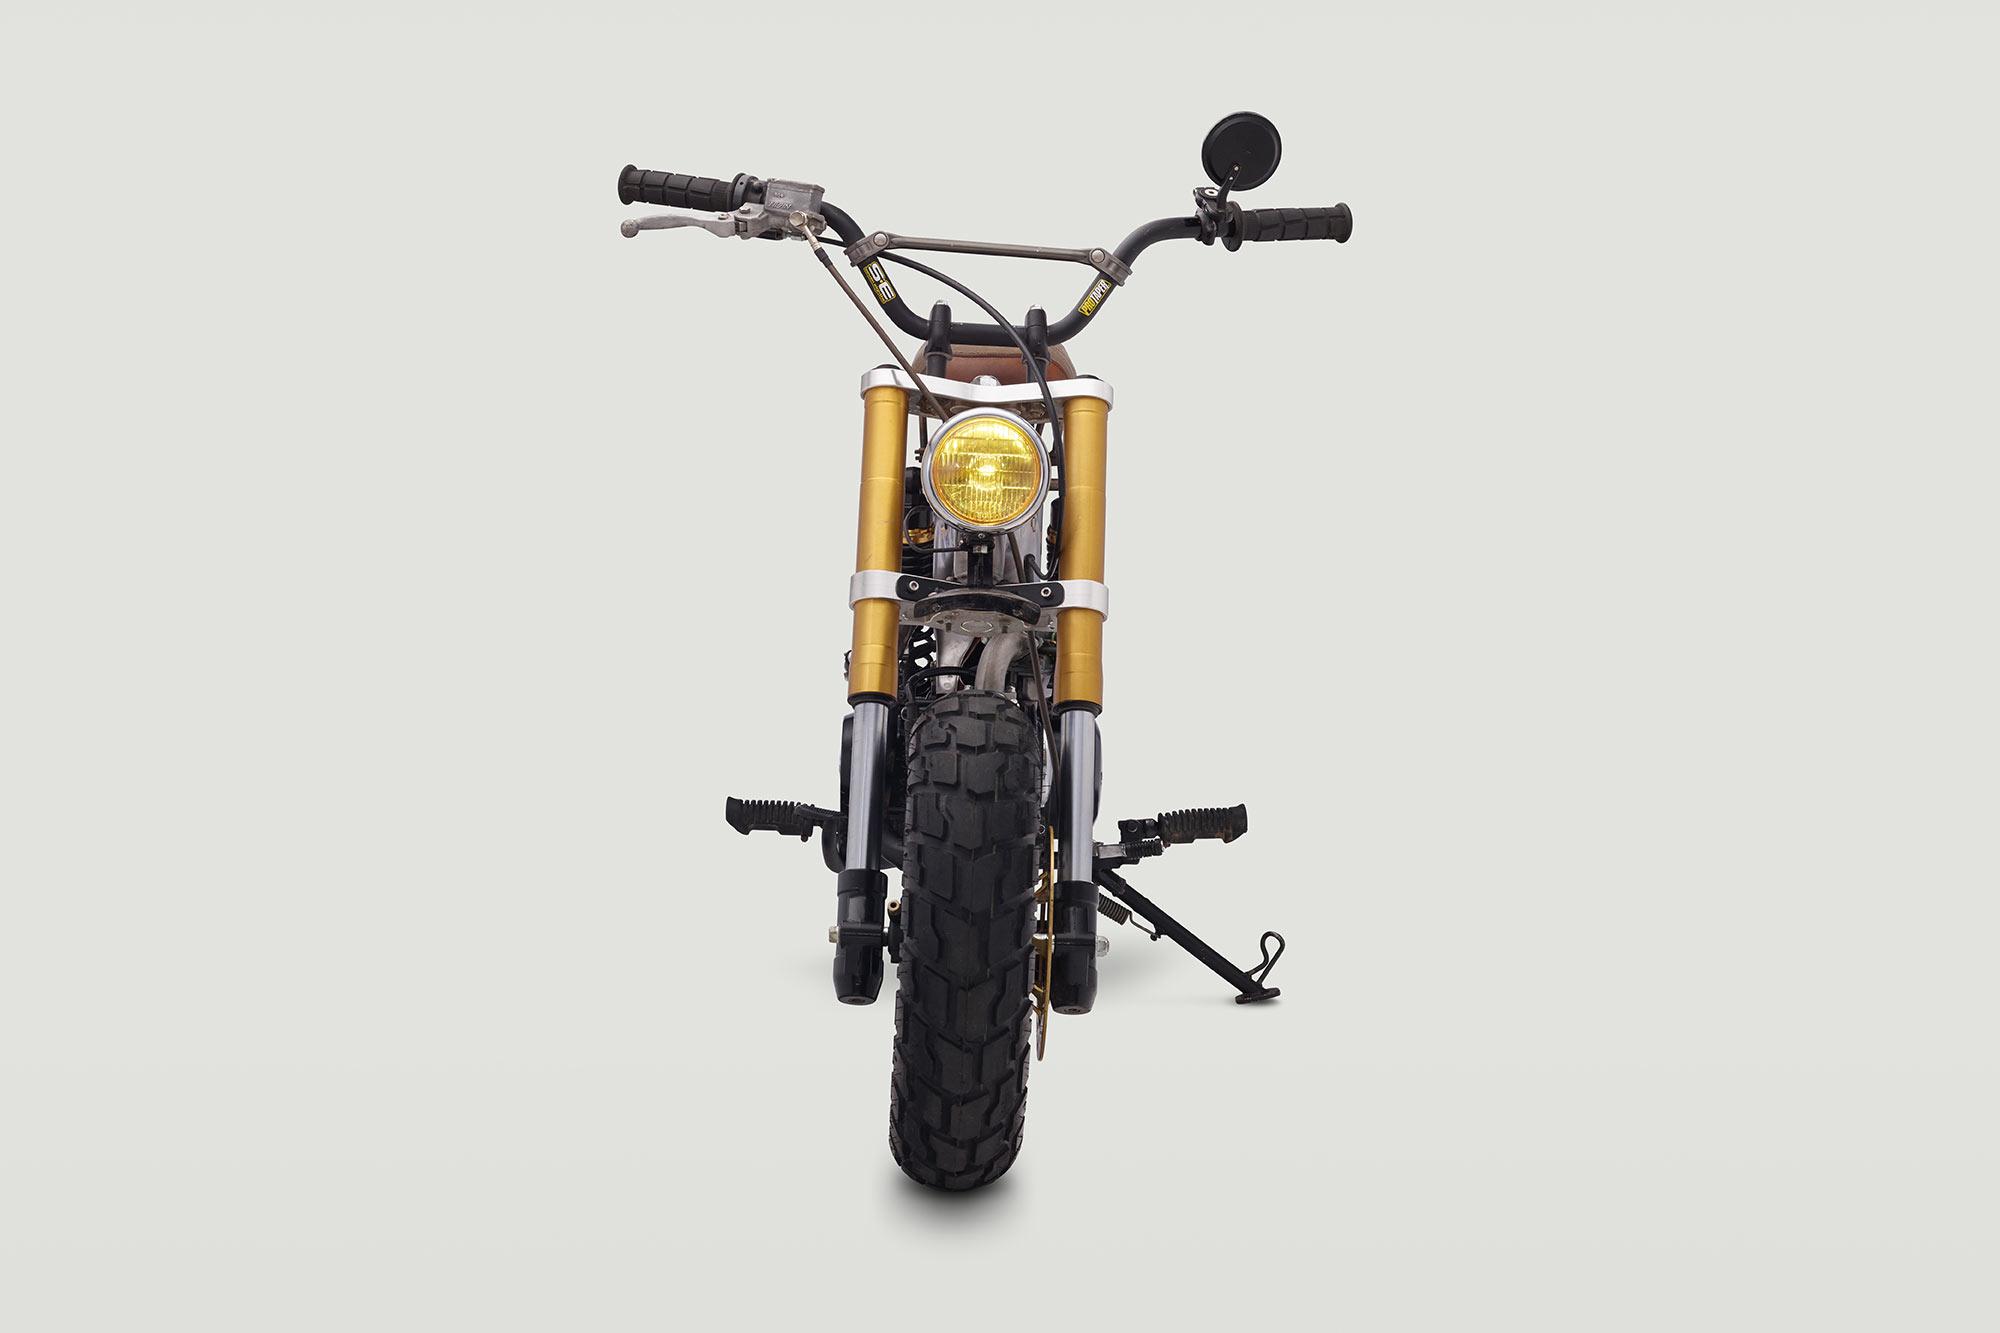 Livin The Dream Classified Motos Junior Honda Ct70 Scrambler